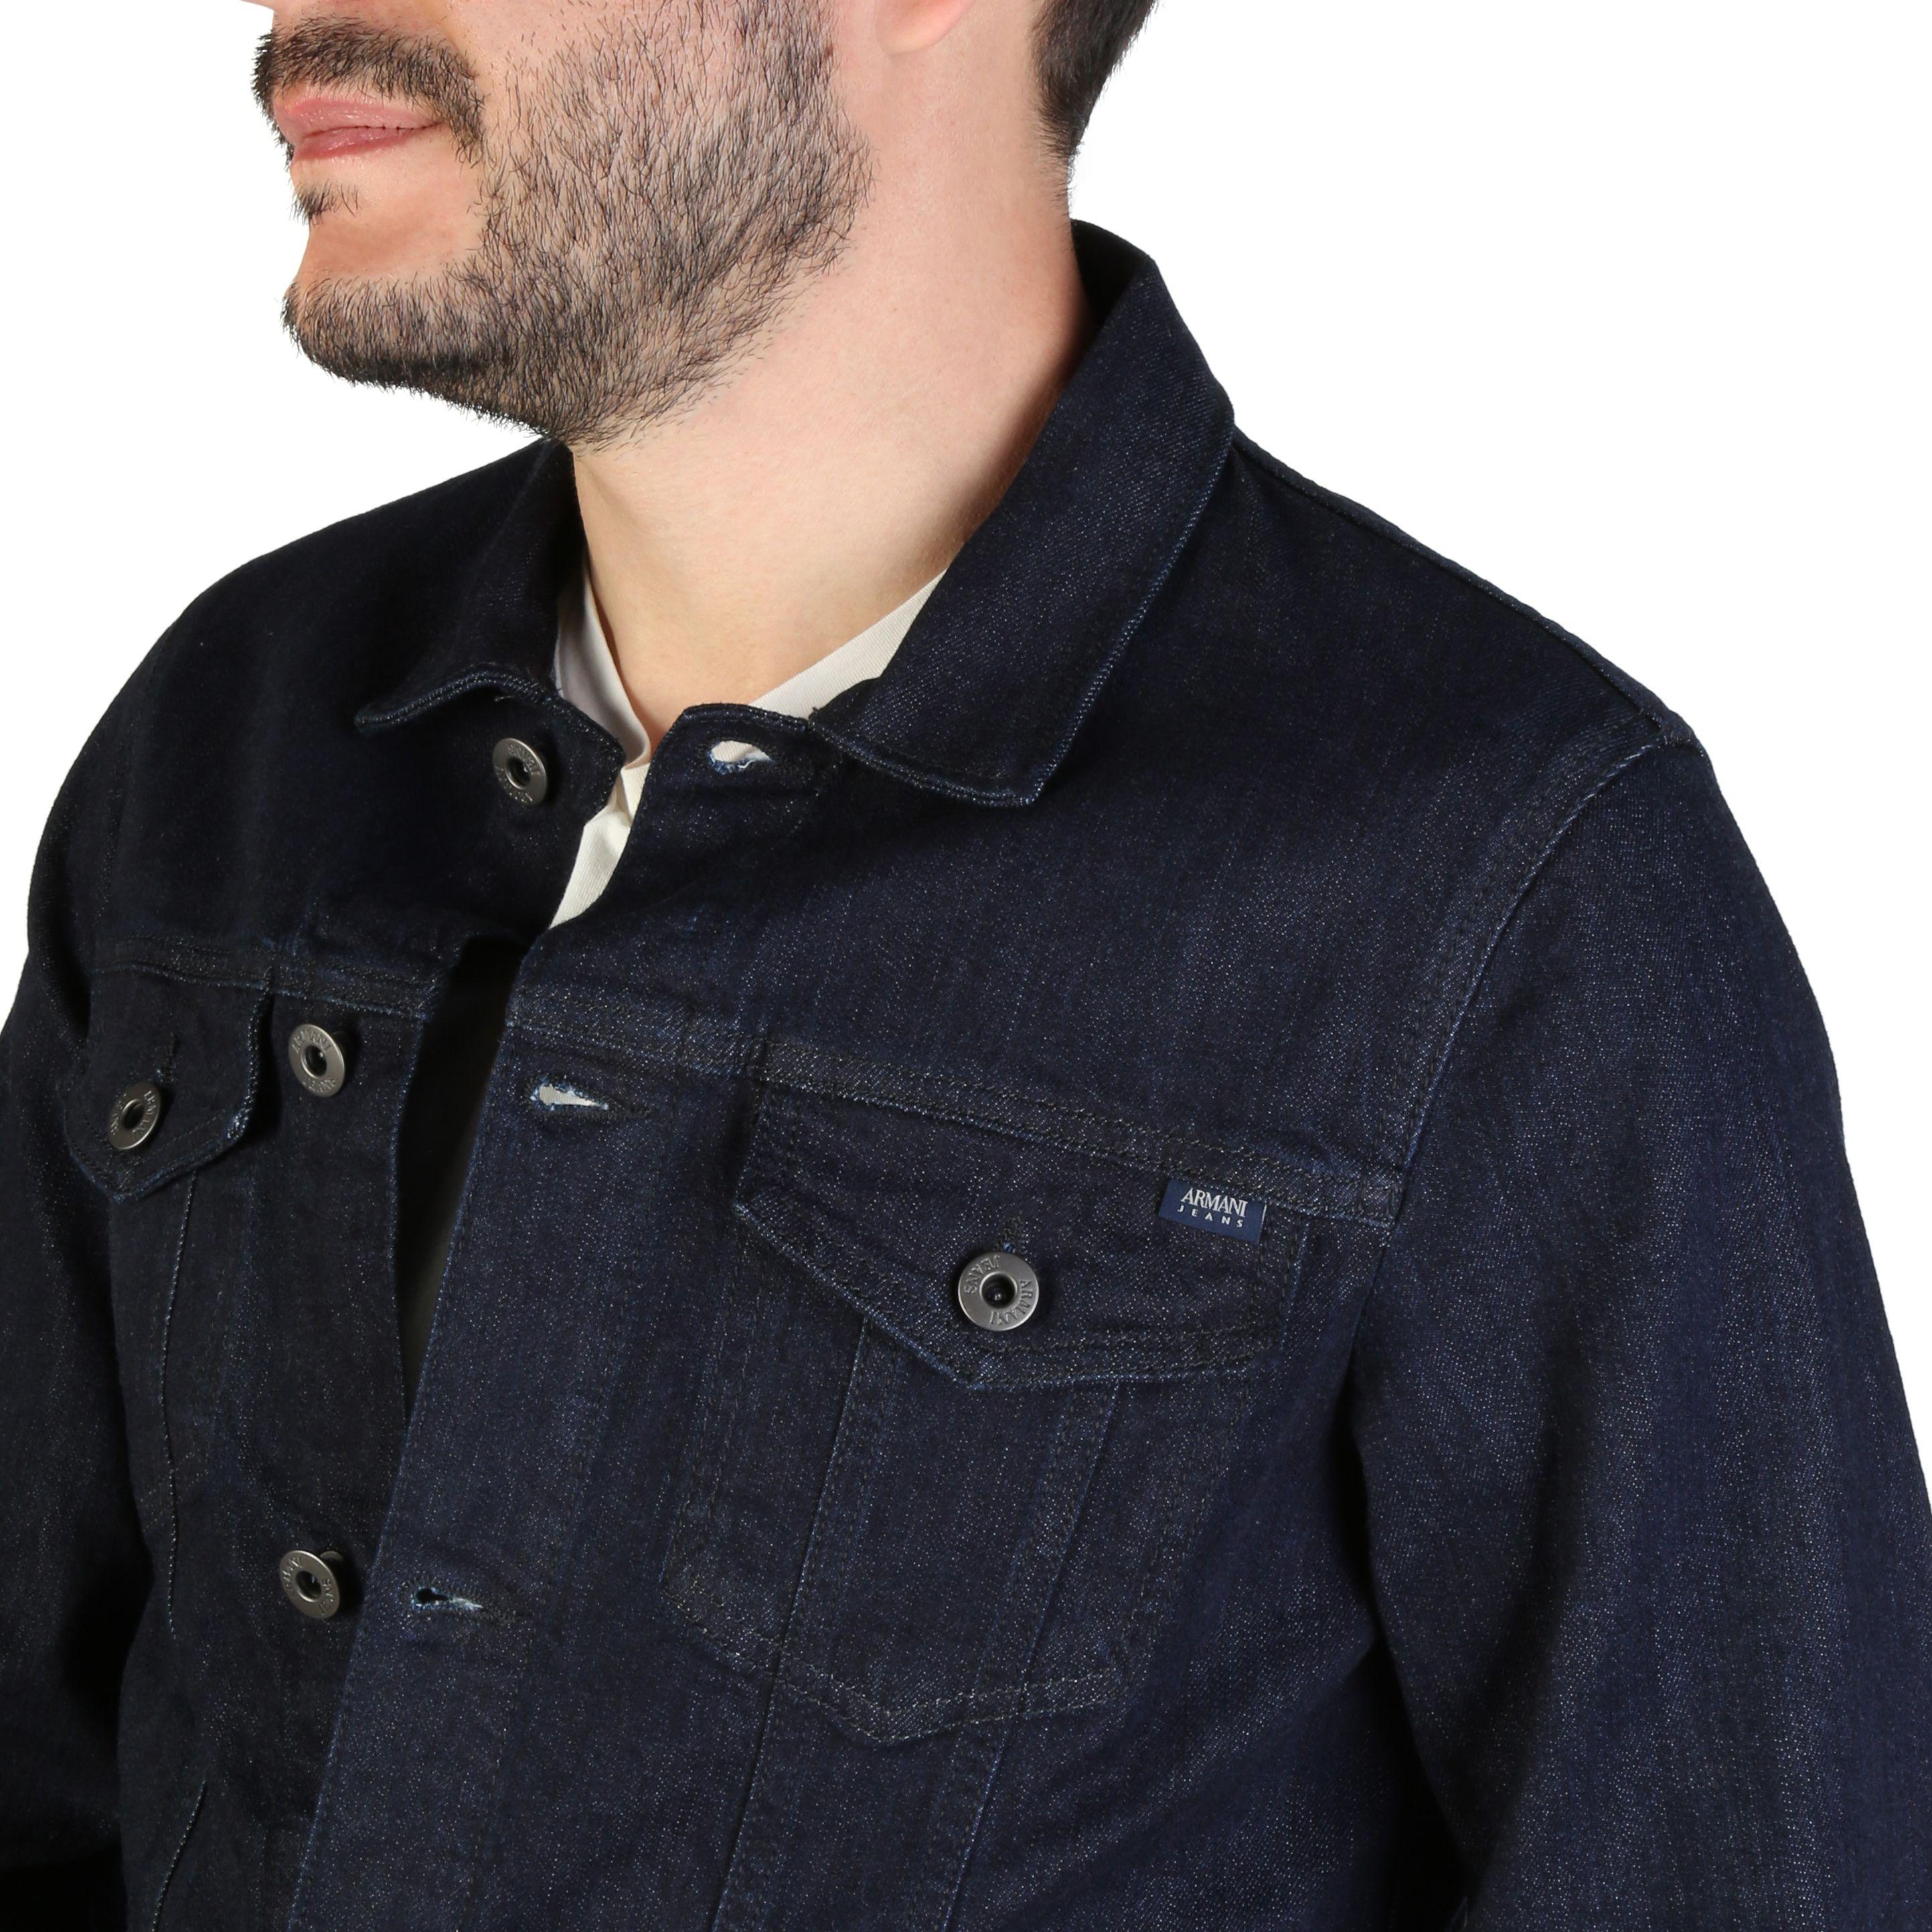 Armani Jeans  | You Fashion Outlet